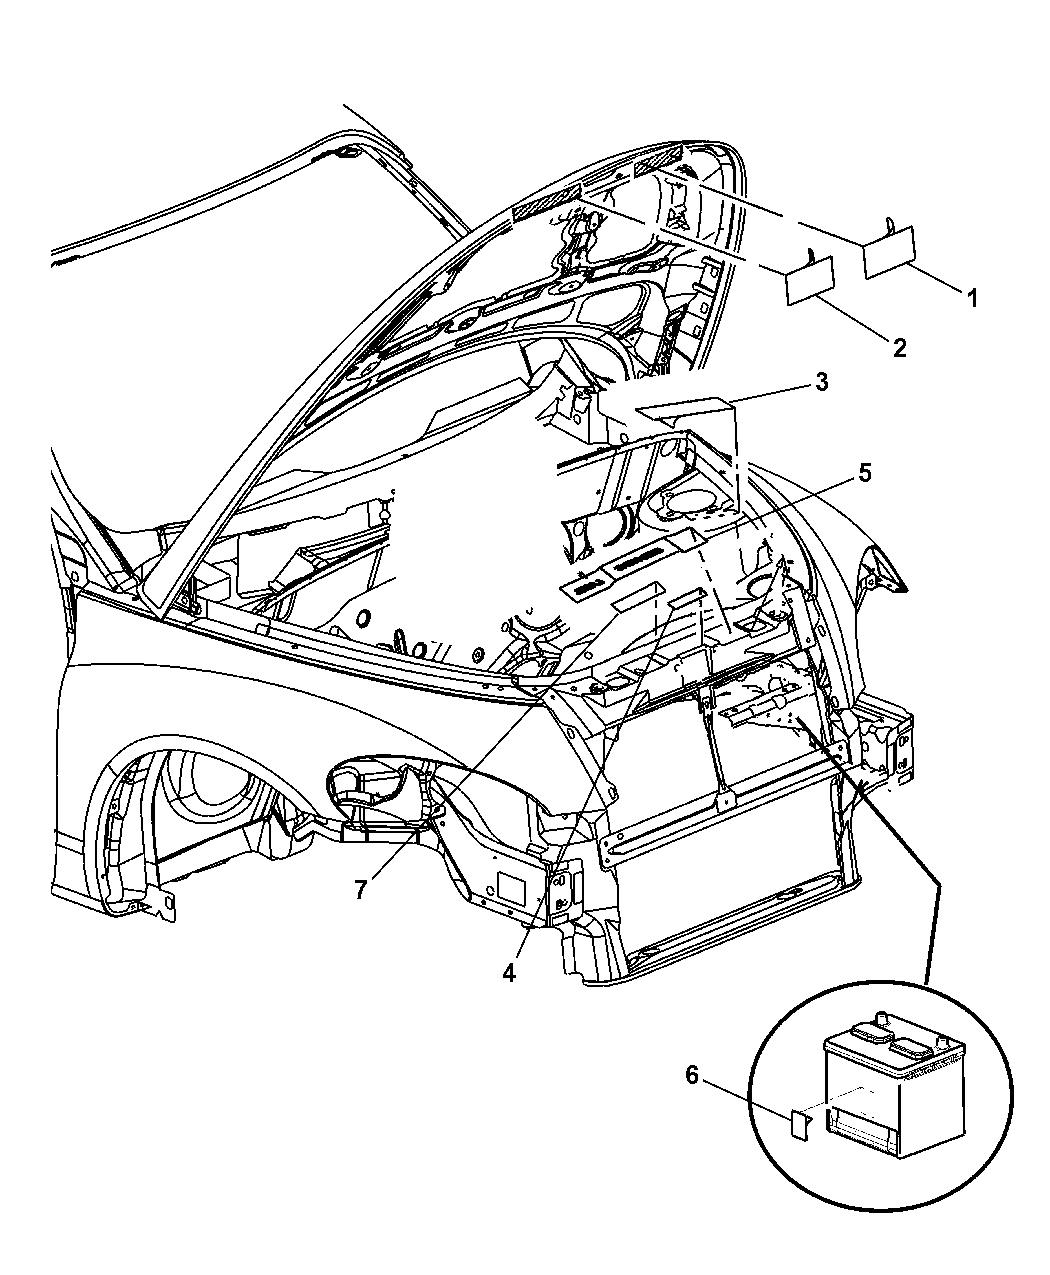 2003 chrysler pt cruiser engine compartment - mopar parts giant 2003 pt cruiser engine diagram 2004 pt cruiser engine diagram mopar parts giant